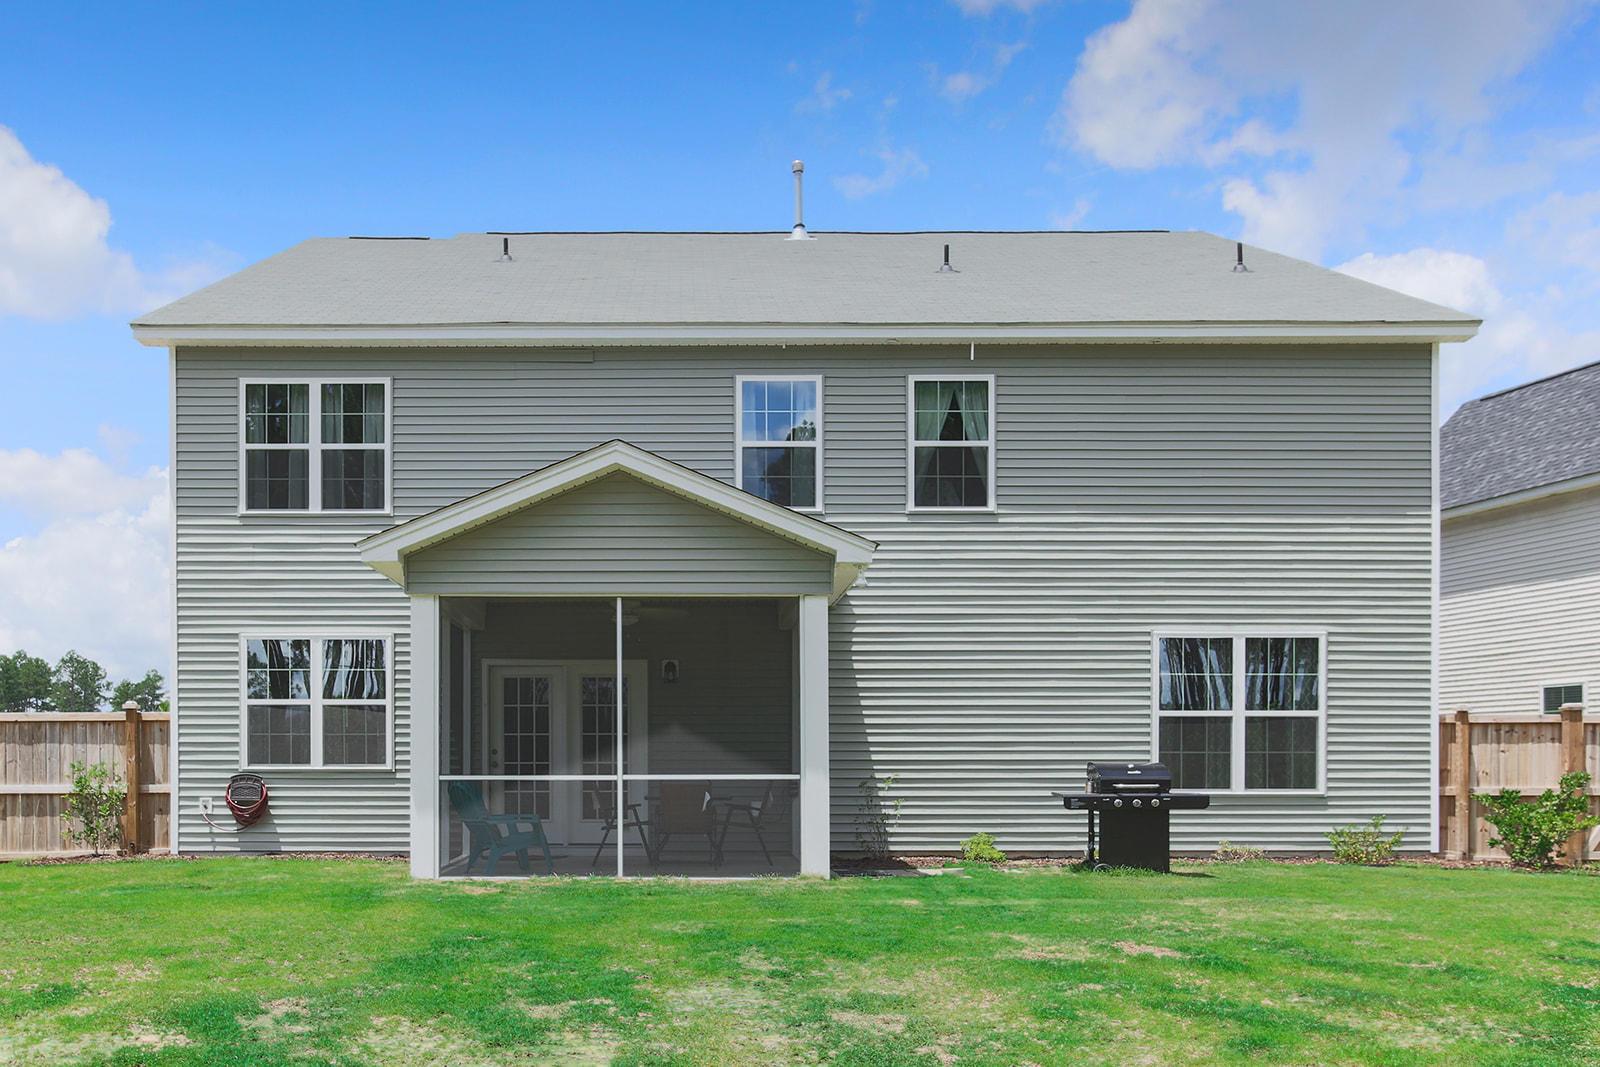 Cane Bay Plantation Homes For Sale - 355 Saxony, Summerville, SC - 7